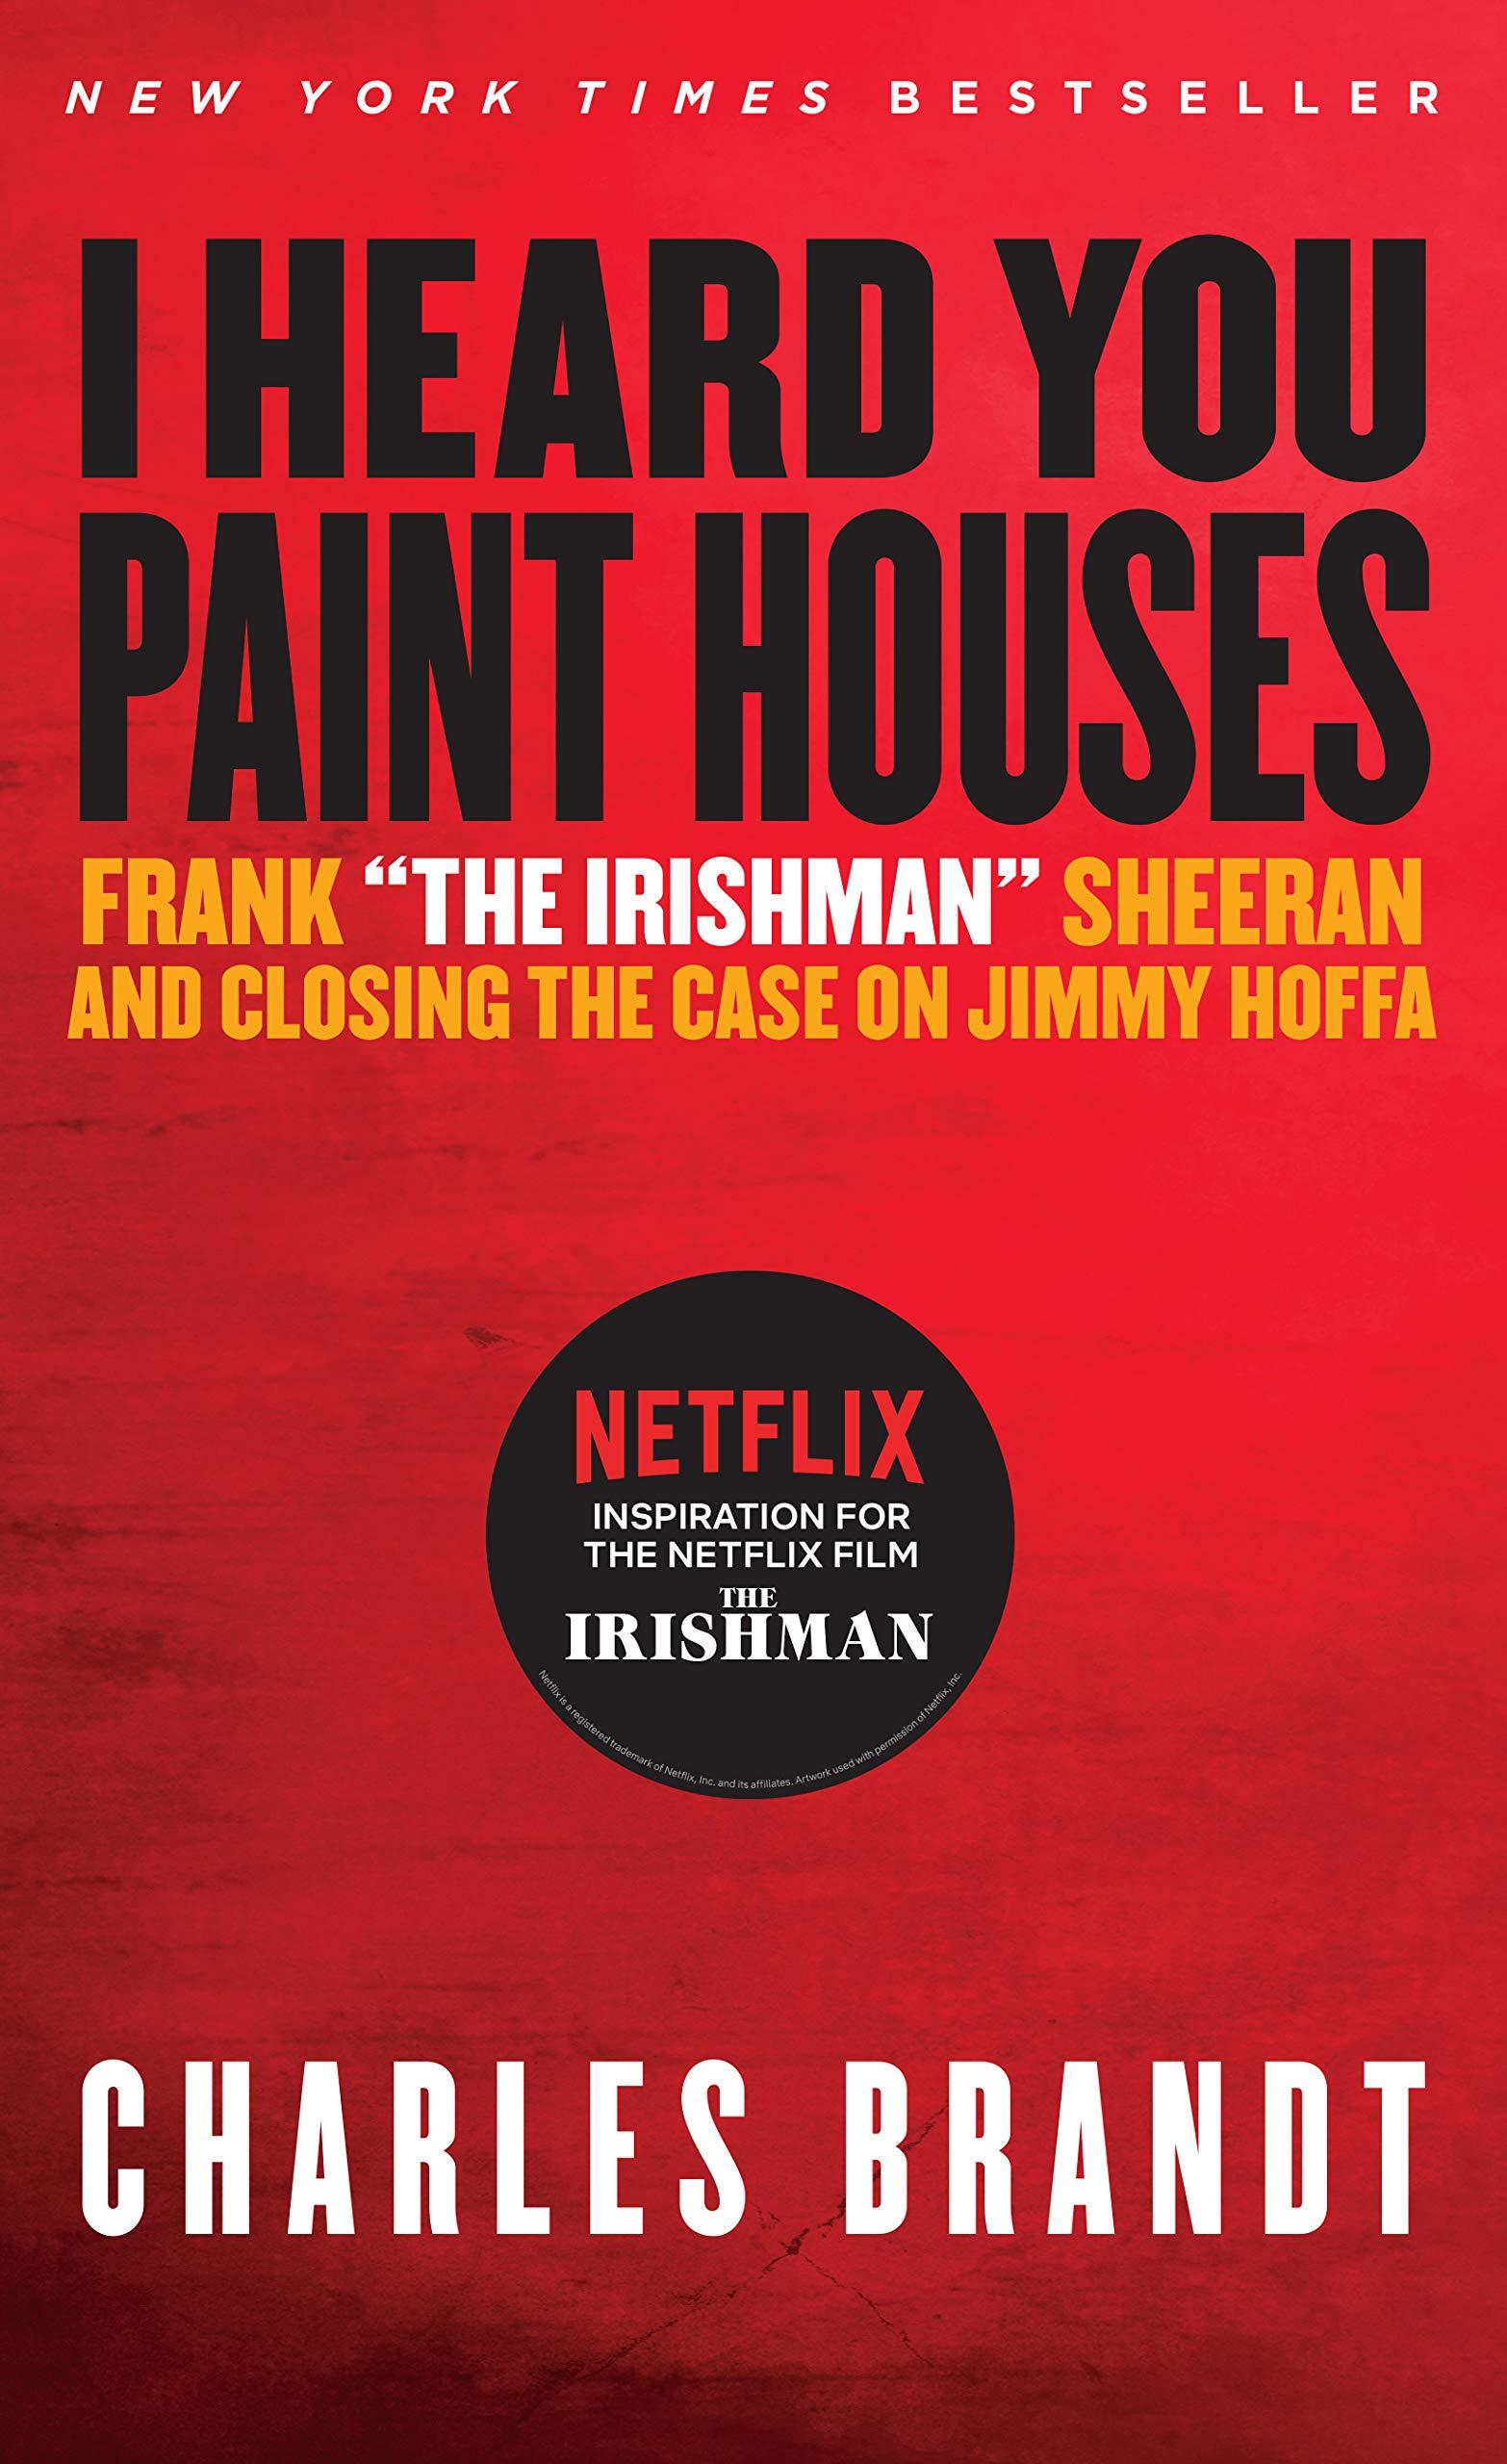 I Heard You Paint Houses: Frank ''The Irishman'' Sheeran & Closing the Case on Jimmy Hoffa by Steerforth Pr